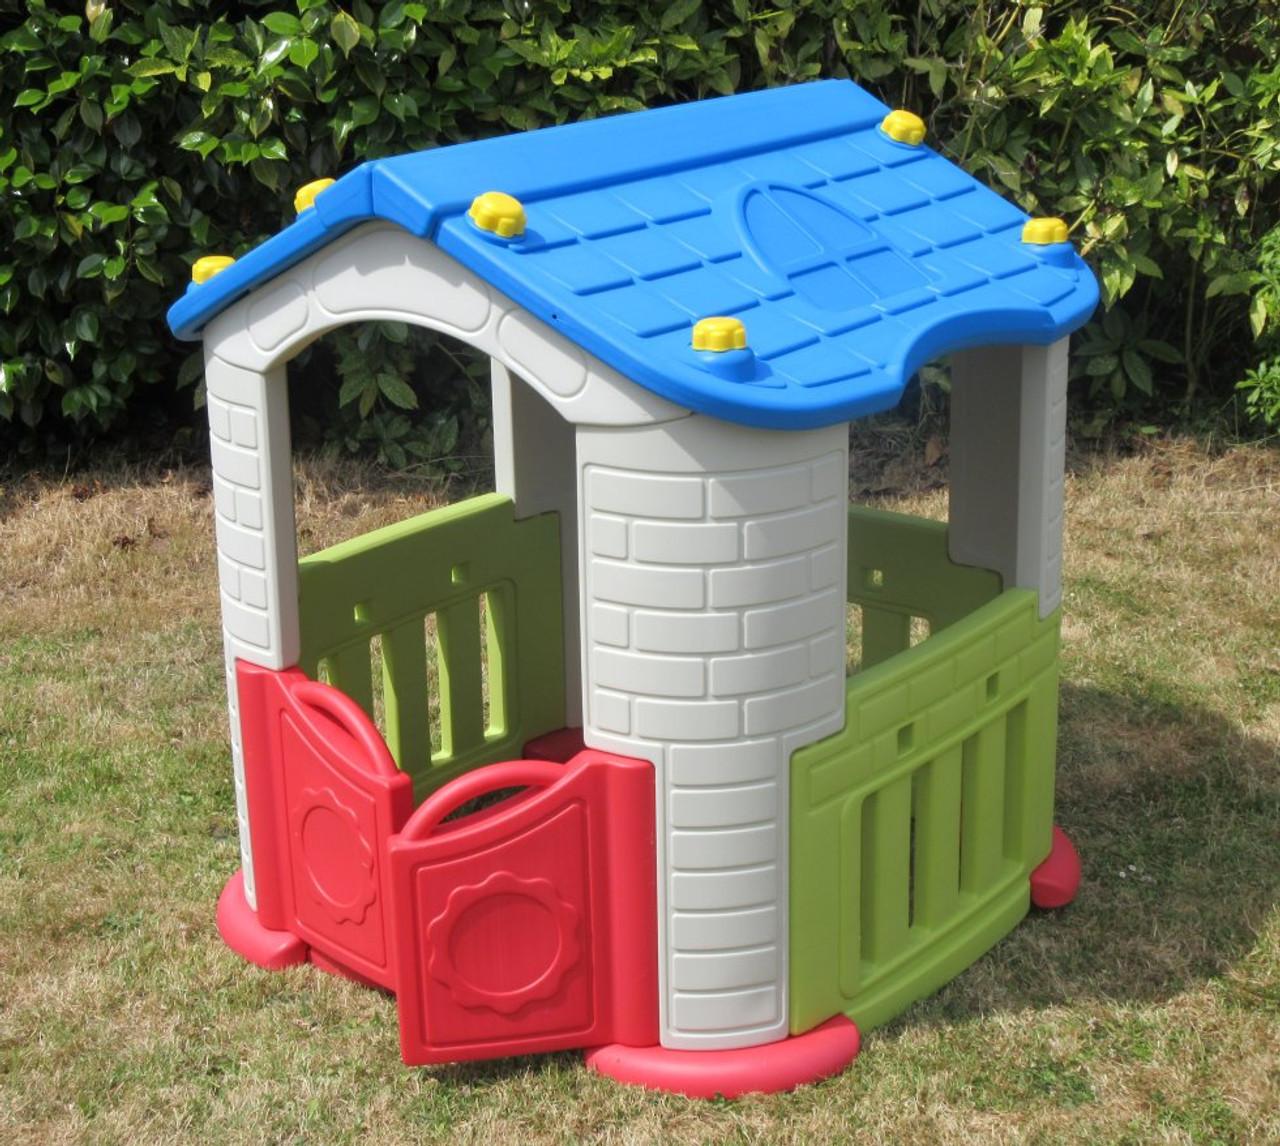 Sunshine Childrens Playhouse Blue Roof Red Doors